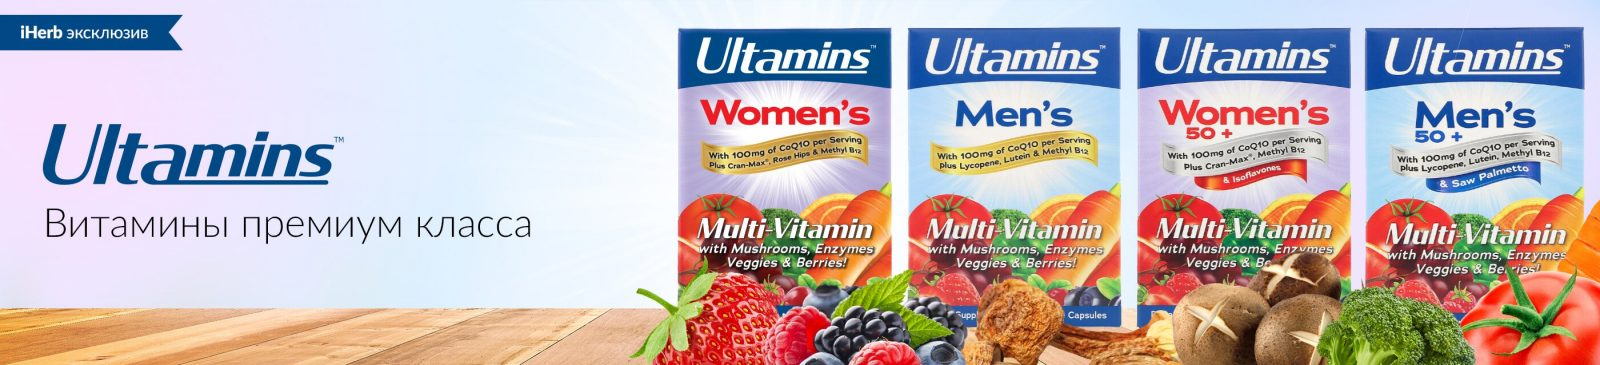 Витамины Ultamins на iHerb